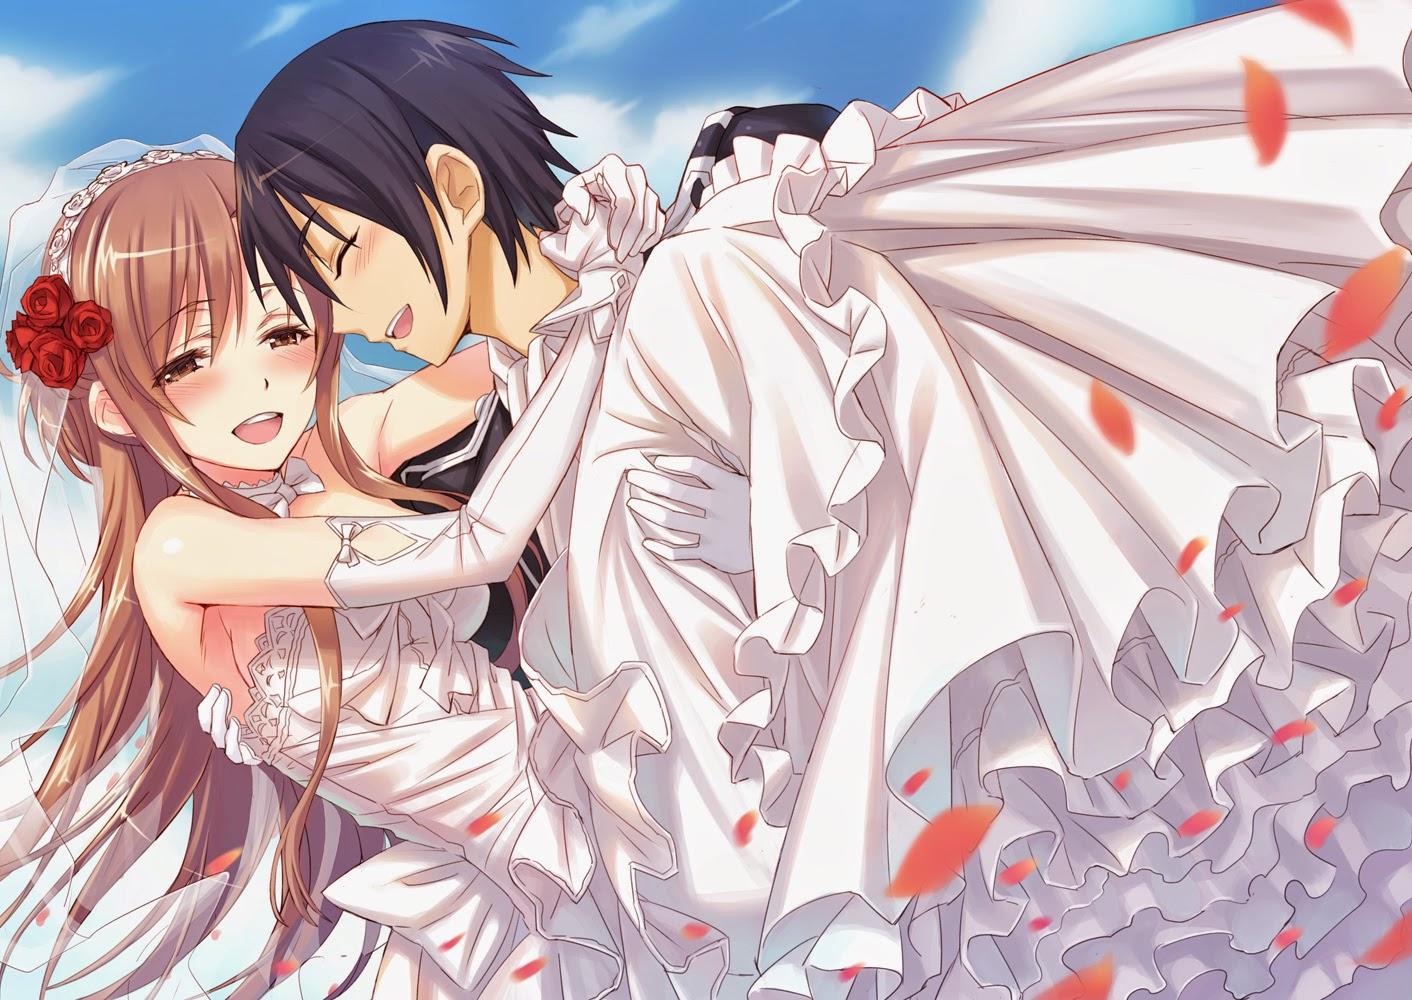 Gambar Animasi Jepang Yang Romantis